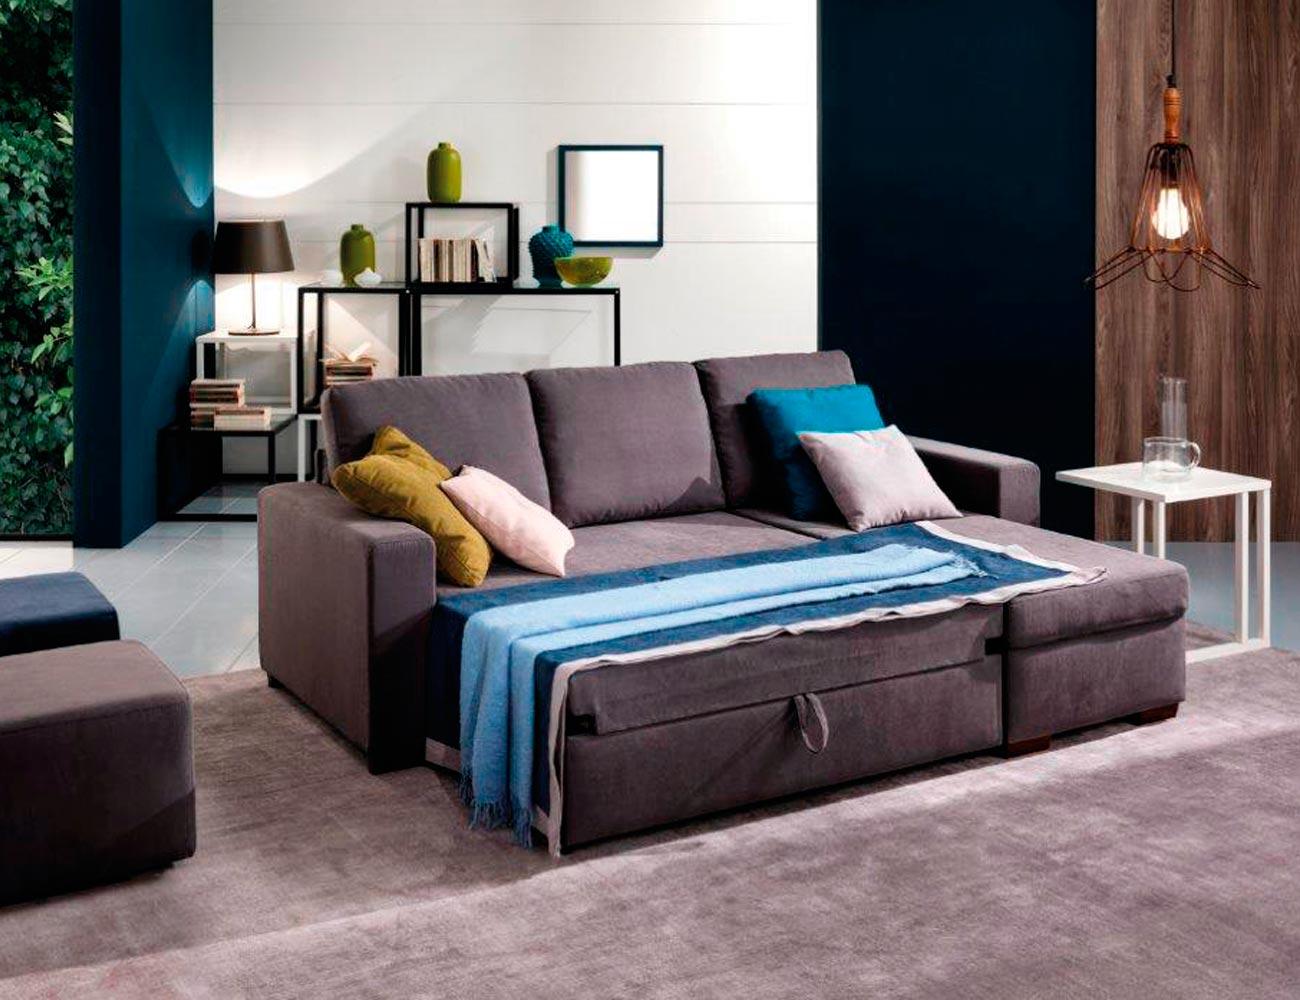 Sofa chaiselongue cama